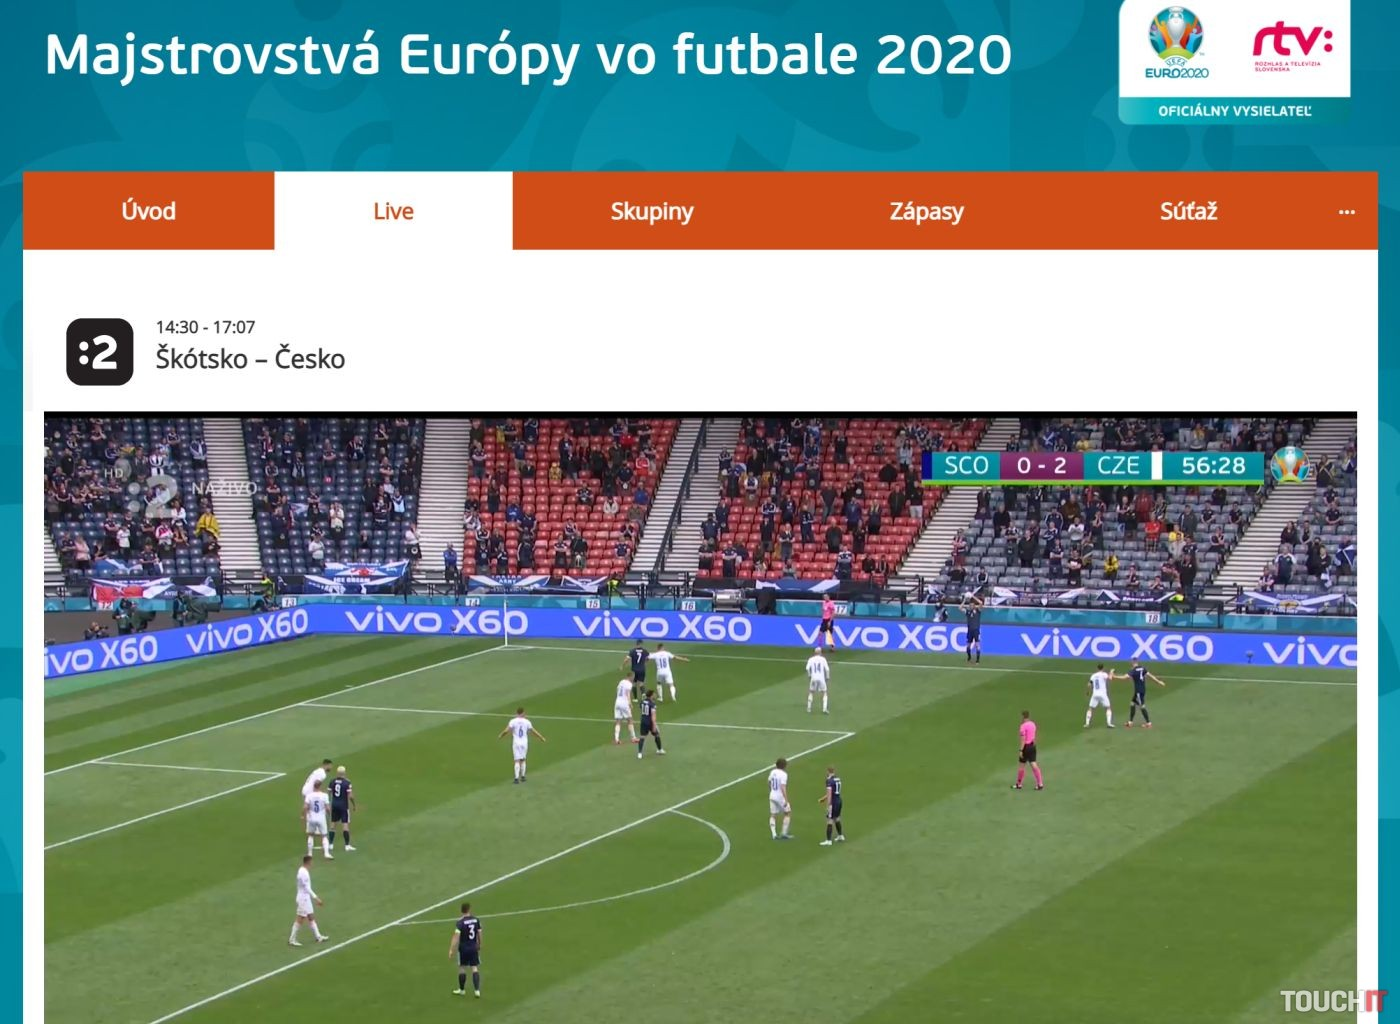 futbal.rtvs.sk